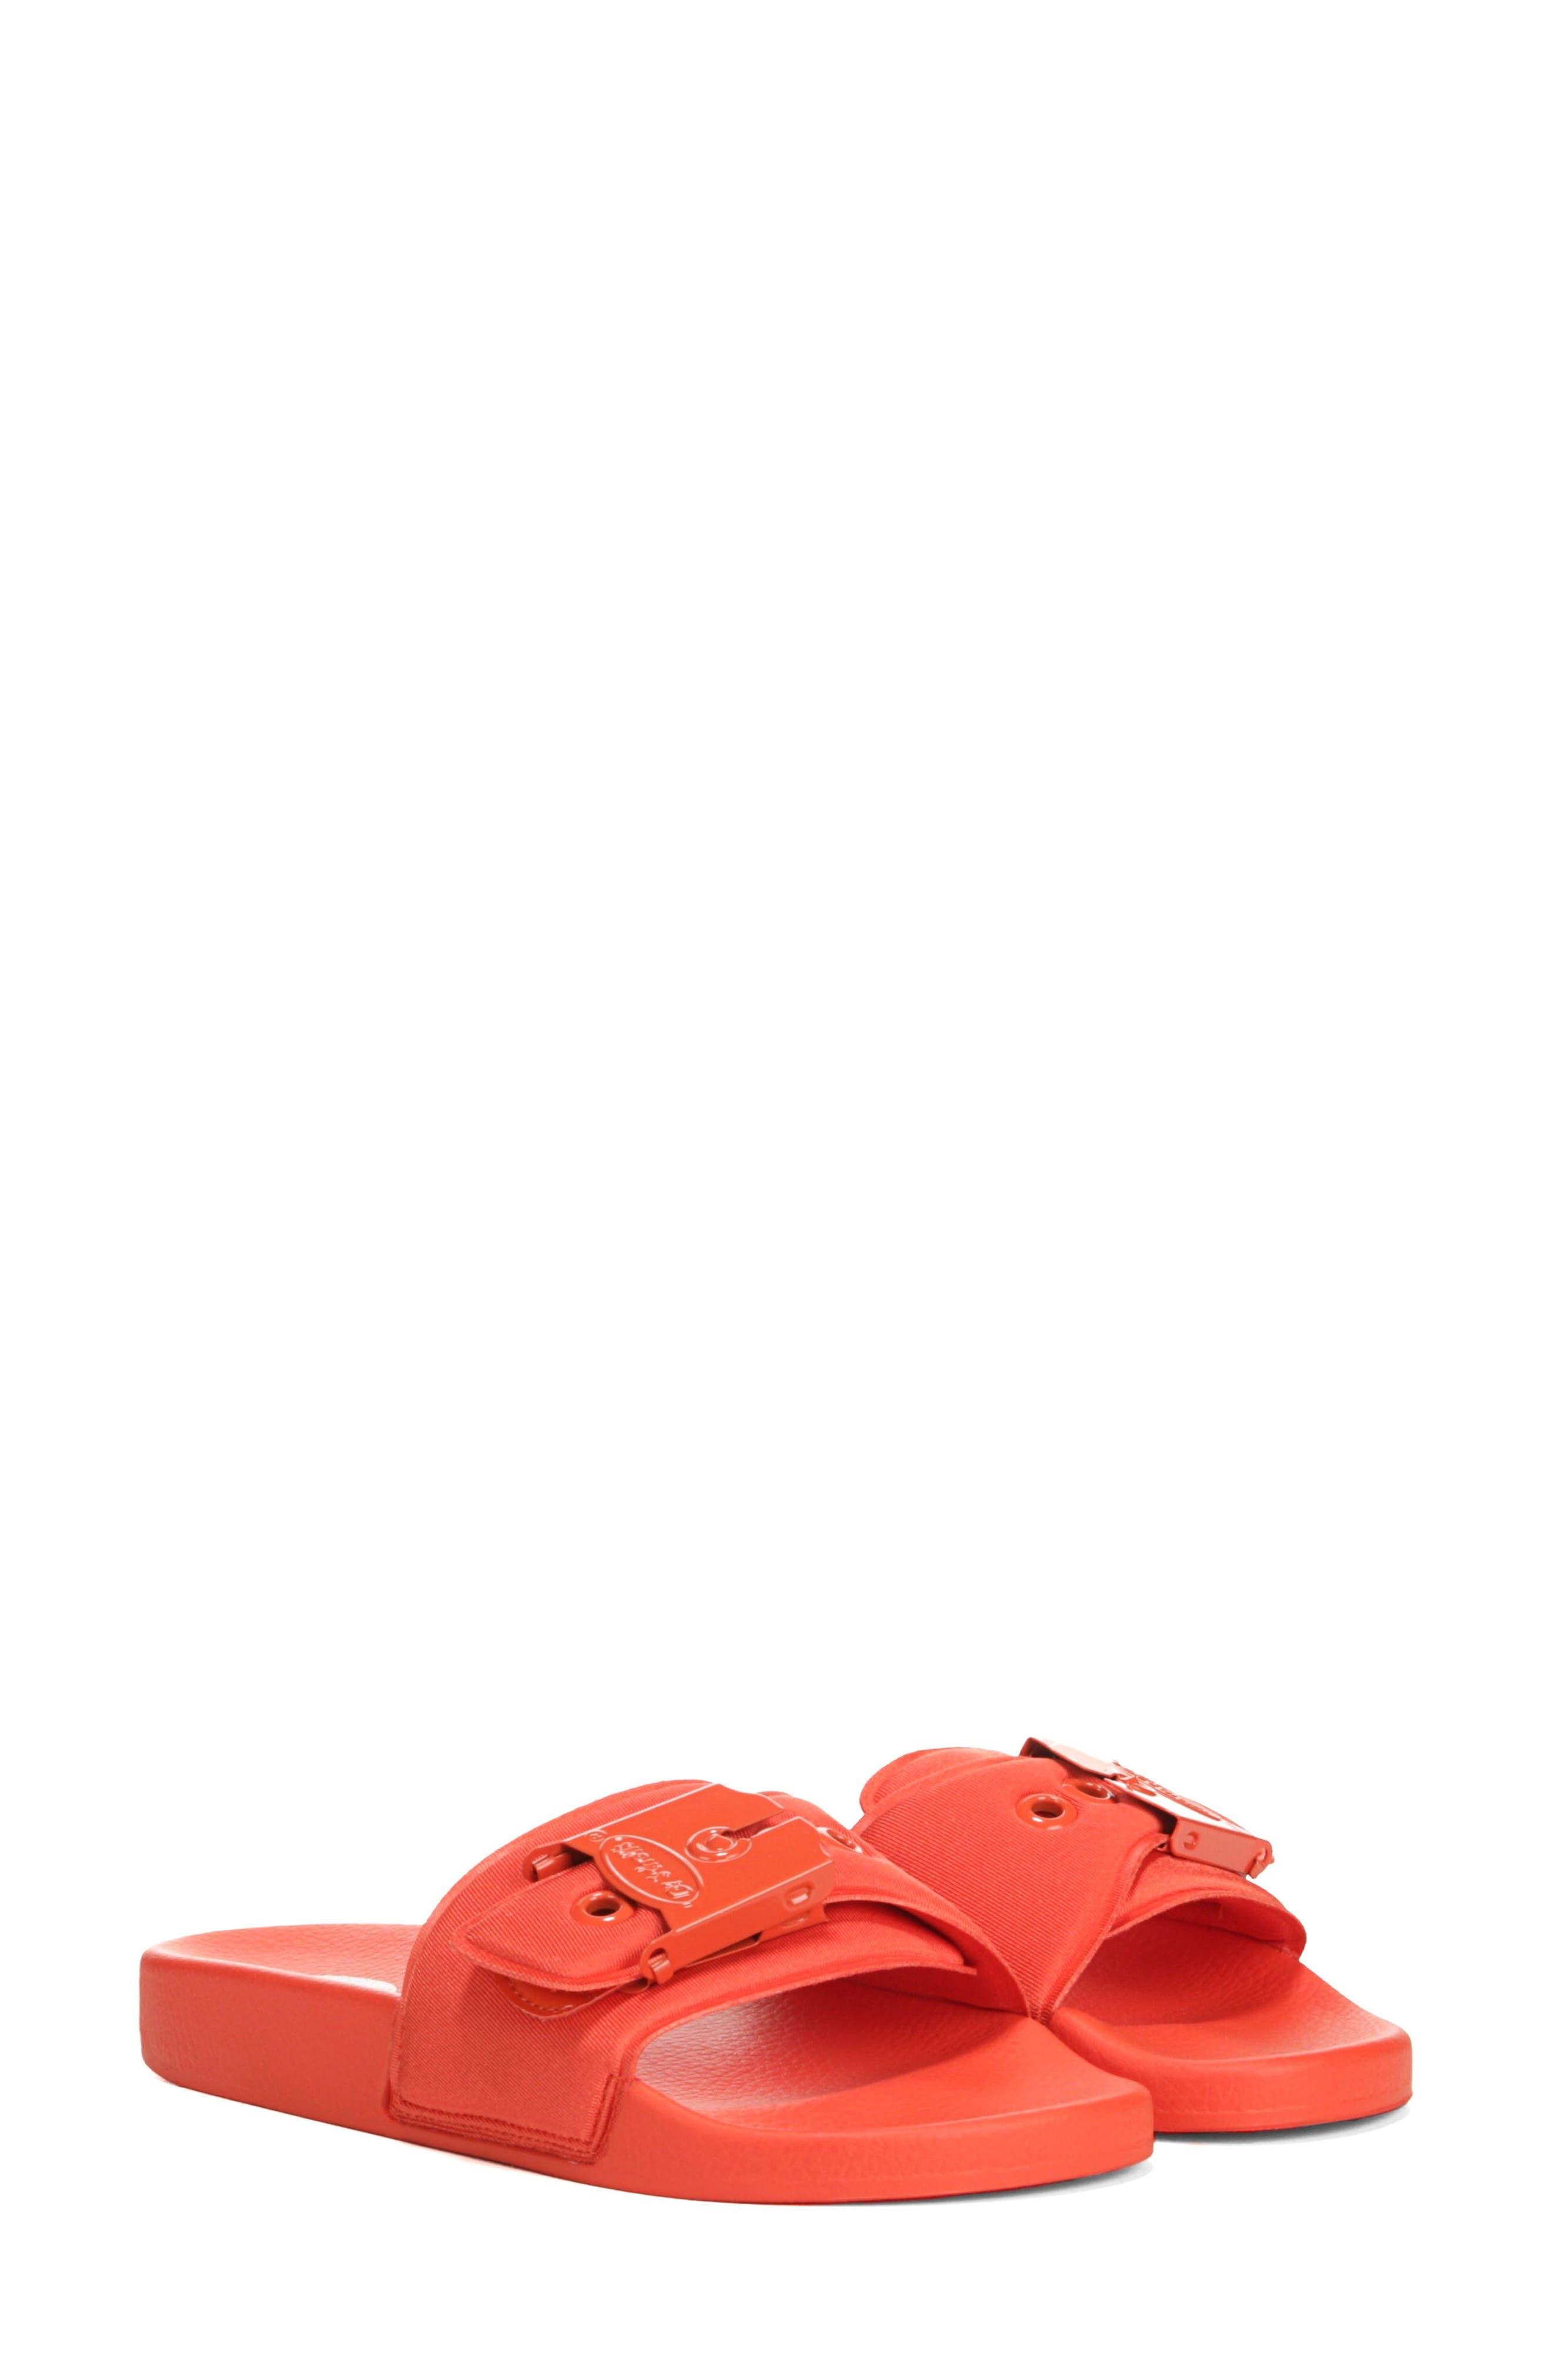 Dr. Scholl's Original Pool Slide Sandal (Women)